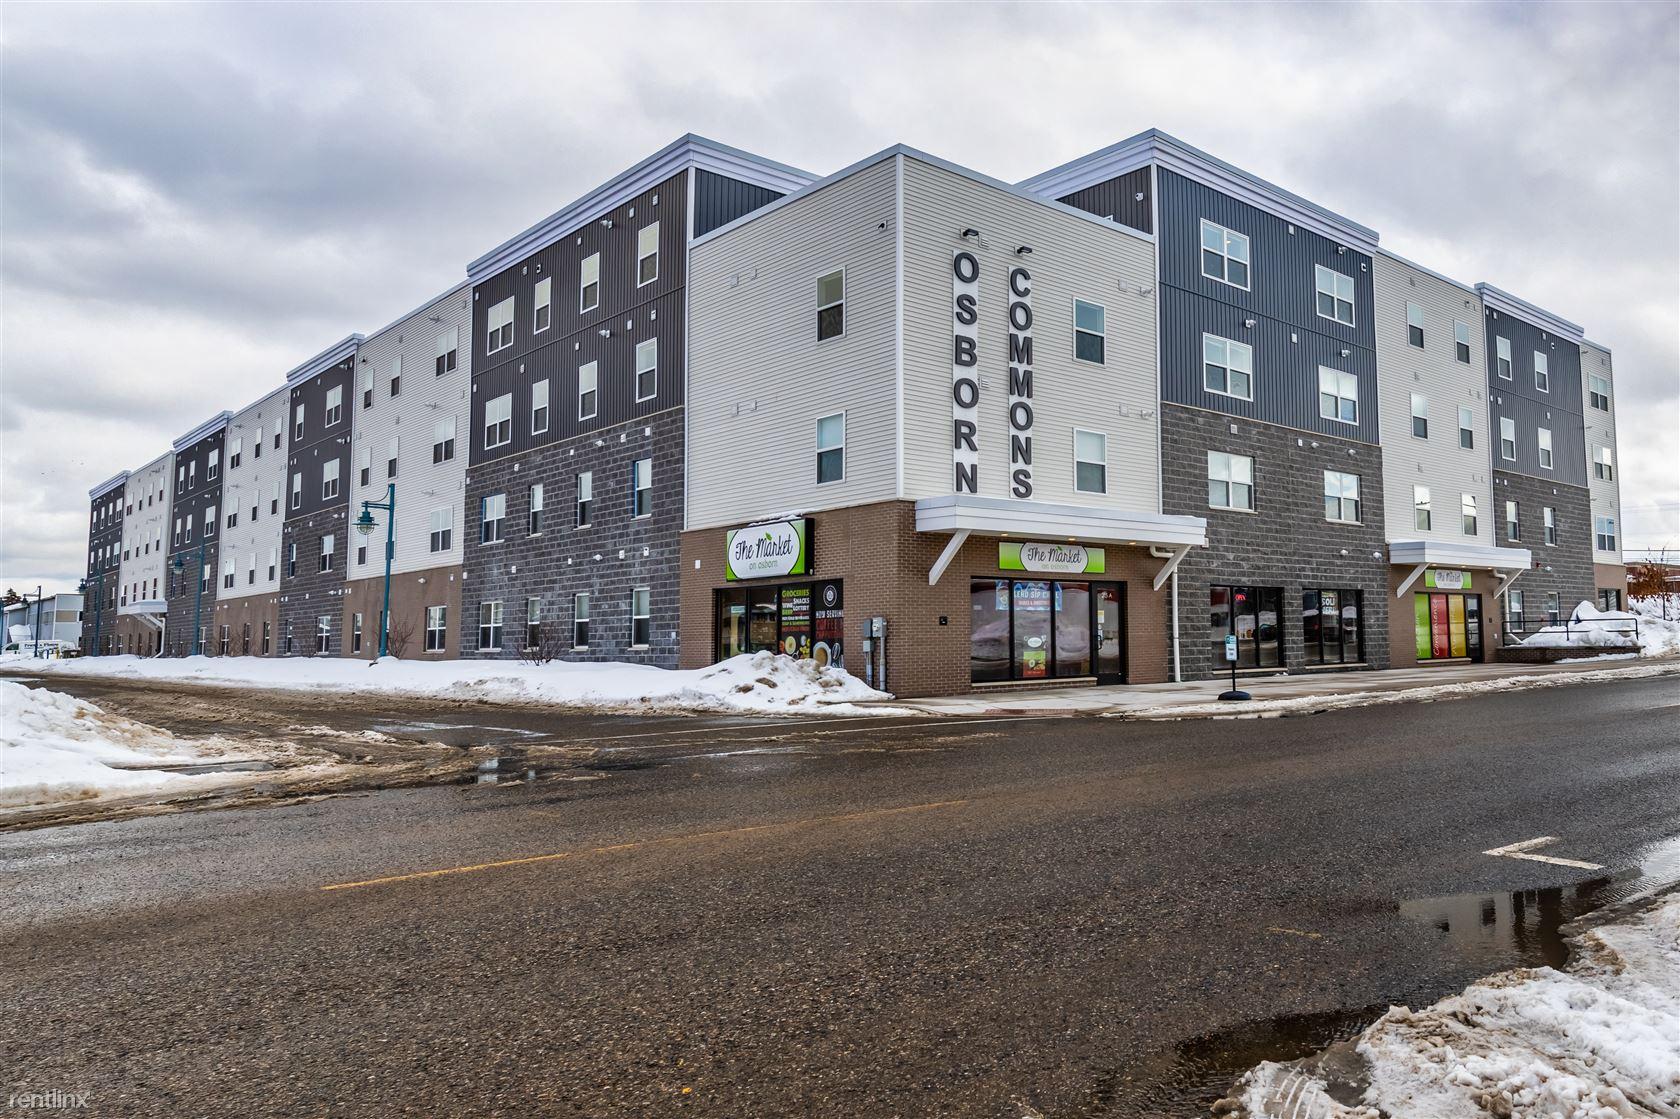 215 Osborn Blvd., Sault Ste. Marie, MI - $324 USD/ month